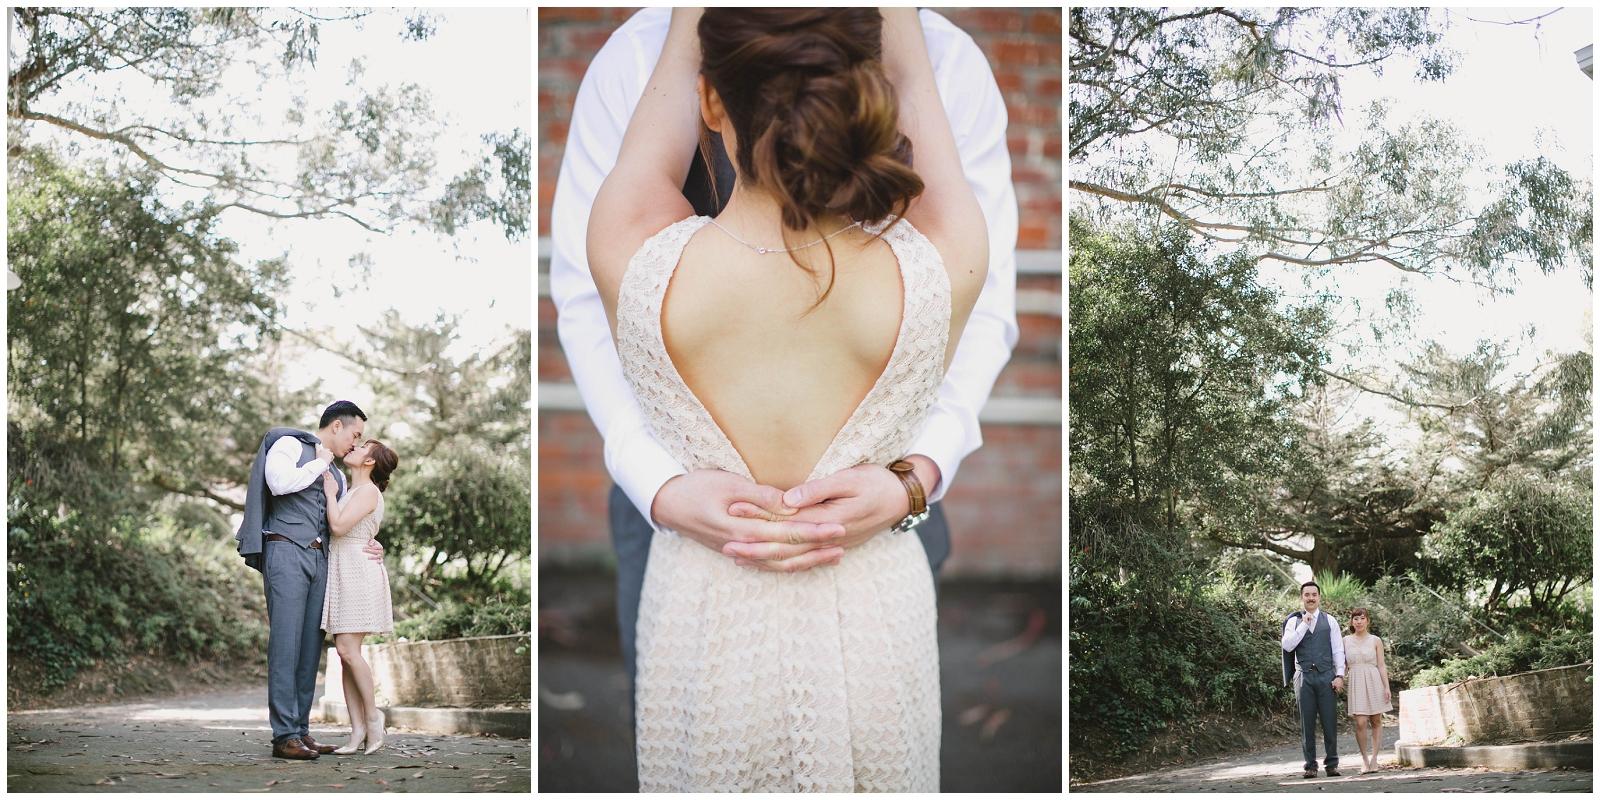 San-Francisco-Bay-Area-Wedding-Photography-Engagement-Treasure-Island-12.jpg